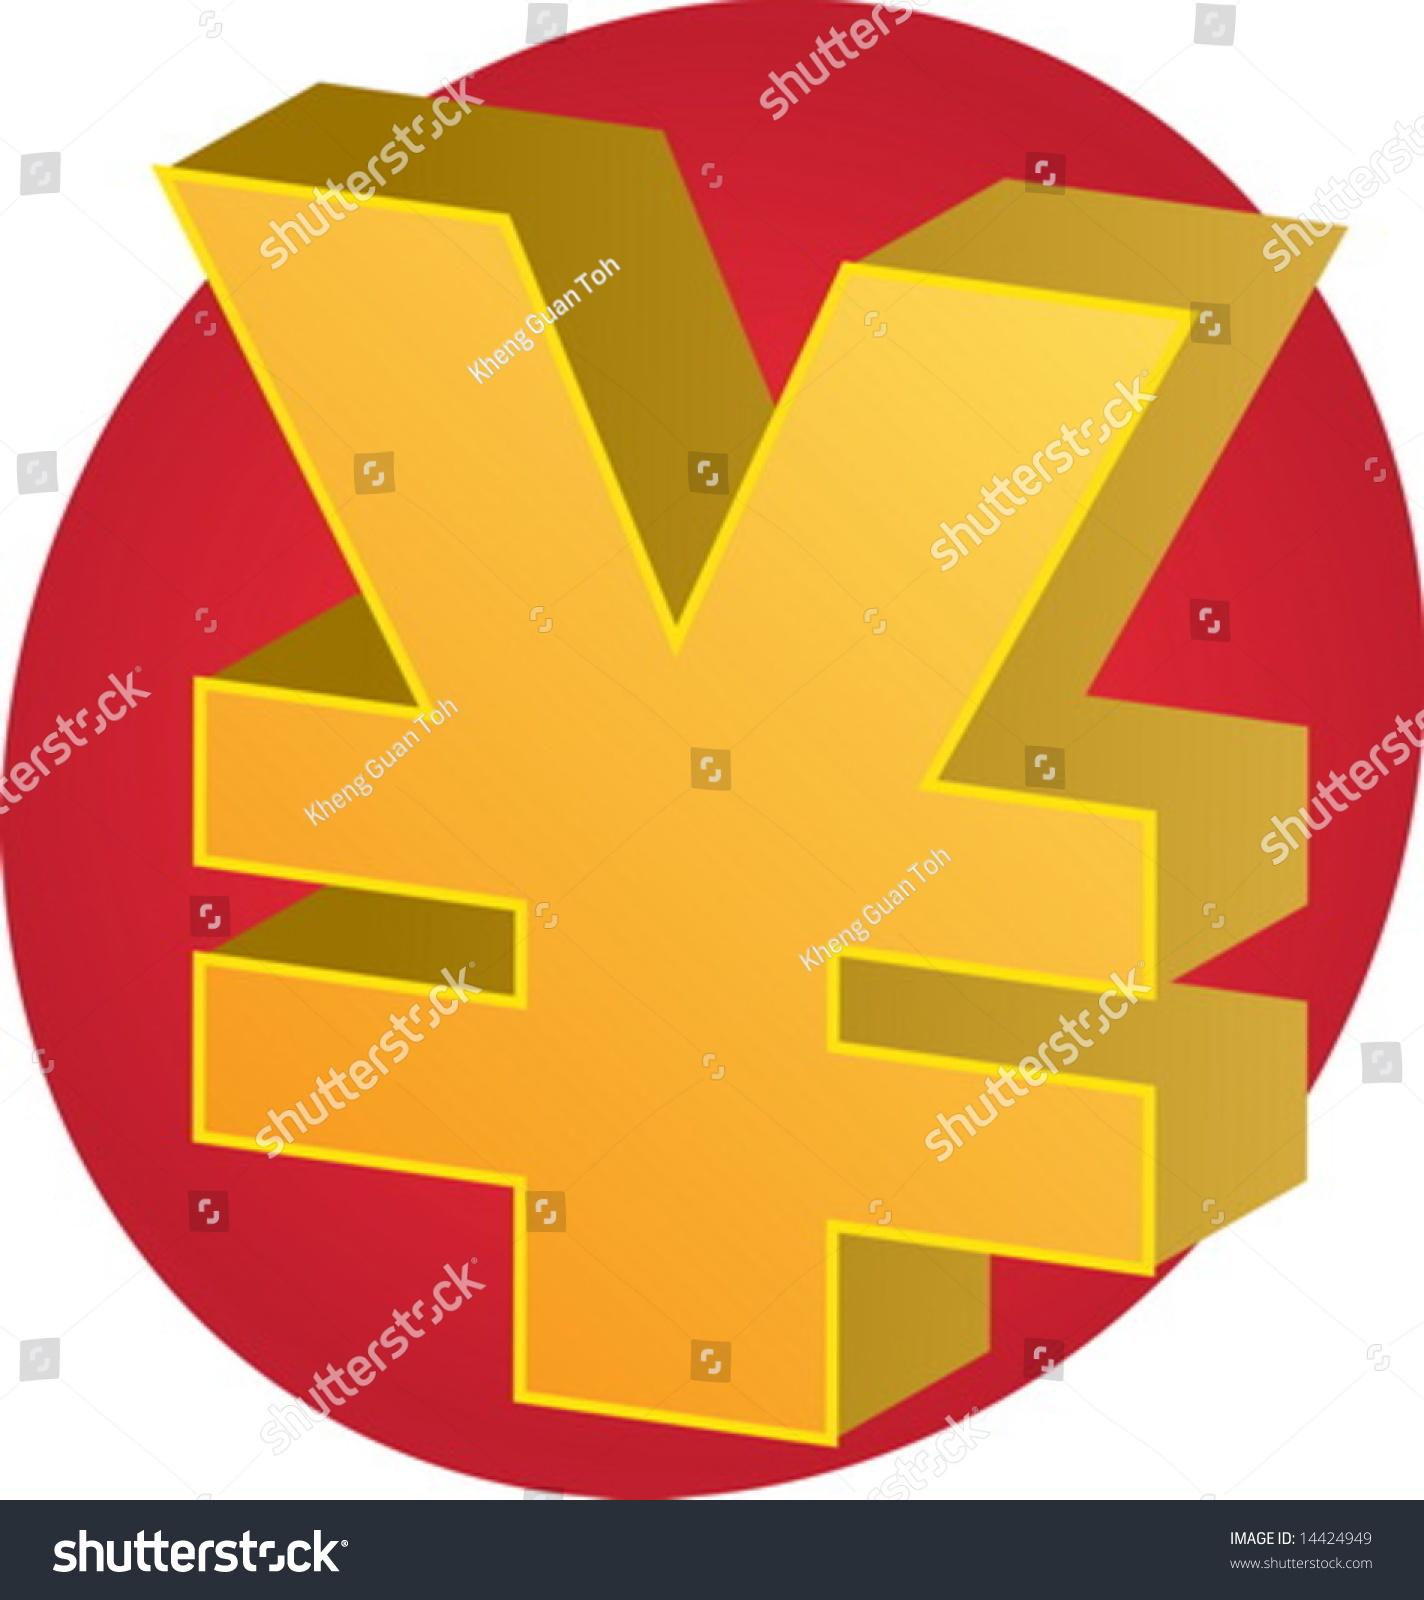 Japanese Yen Currency Symbol Isometric Illustration 3d Ez Canvas